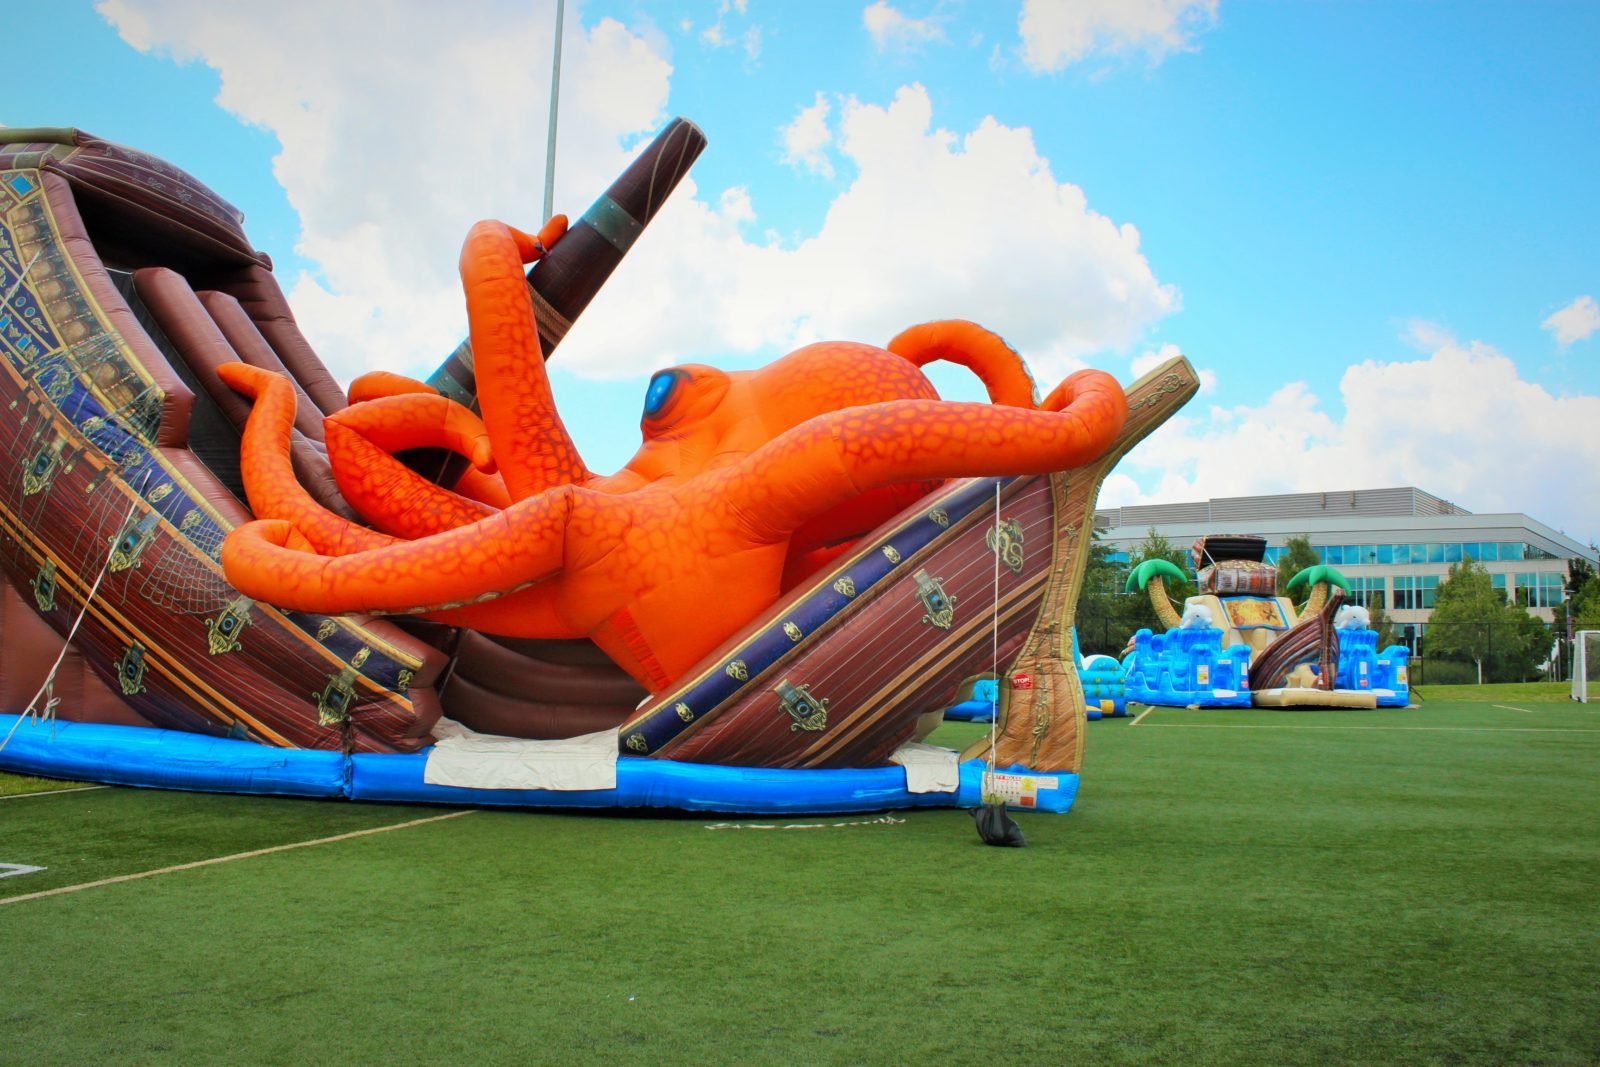 Kraken Sea Monster And Pirate Ship Inflatable Slide Rental